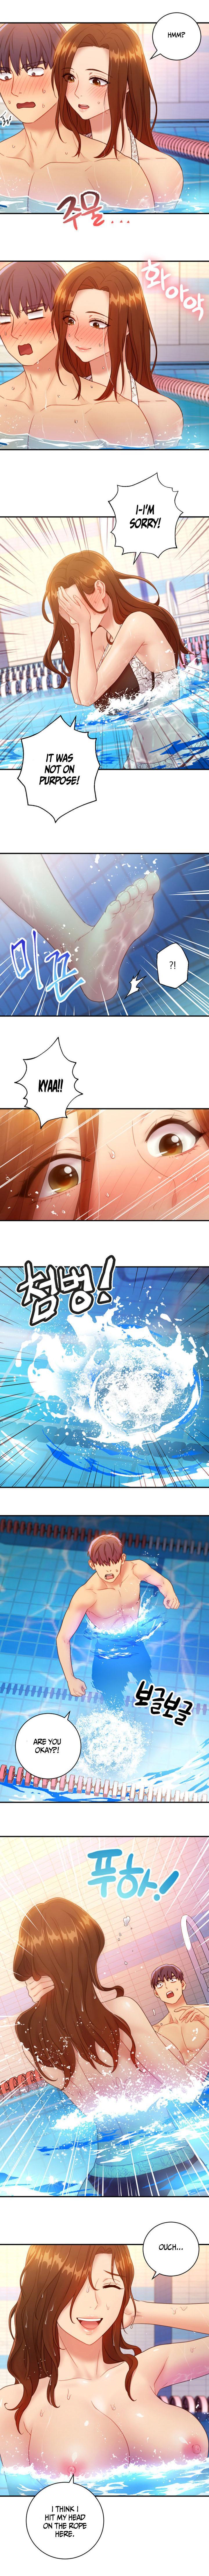 [Neck Pilllow] Stepmother Friends Ch.39/? [English] [Hentai Universe] NEW! 13/10/2020 315